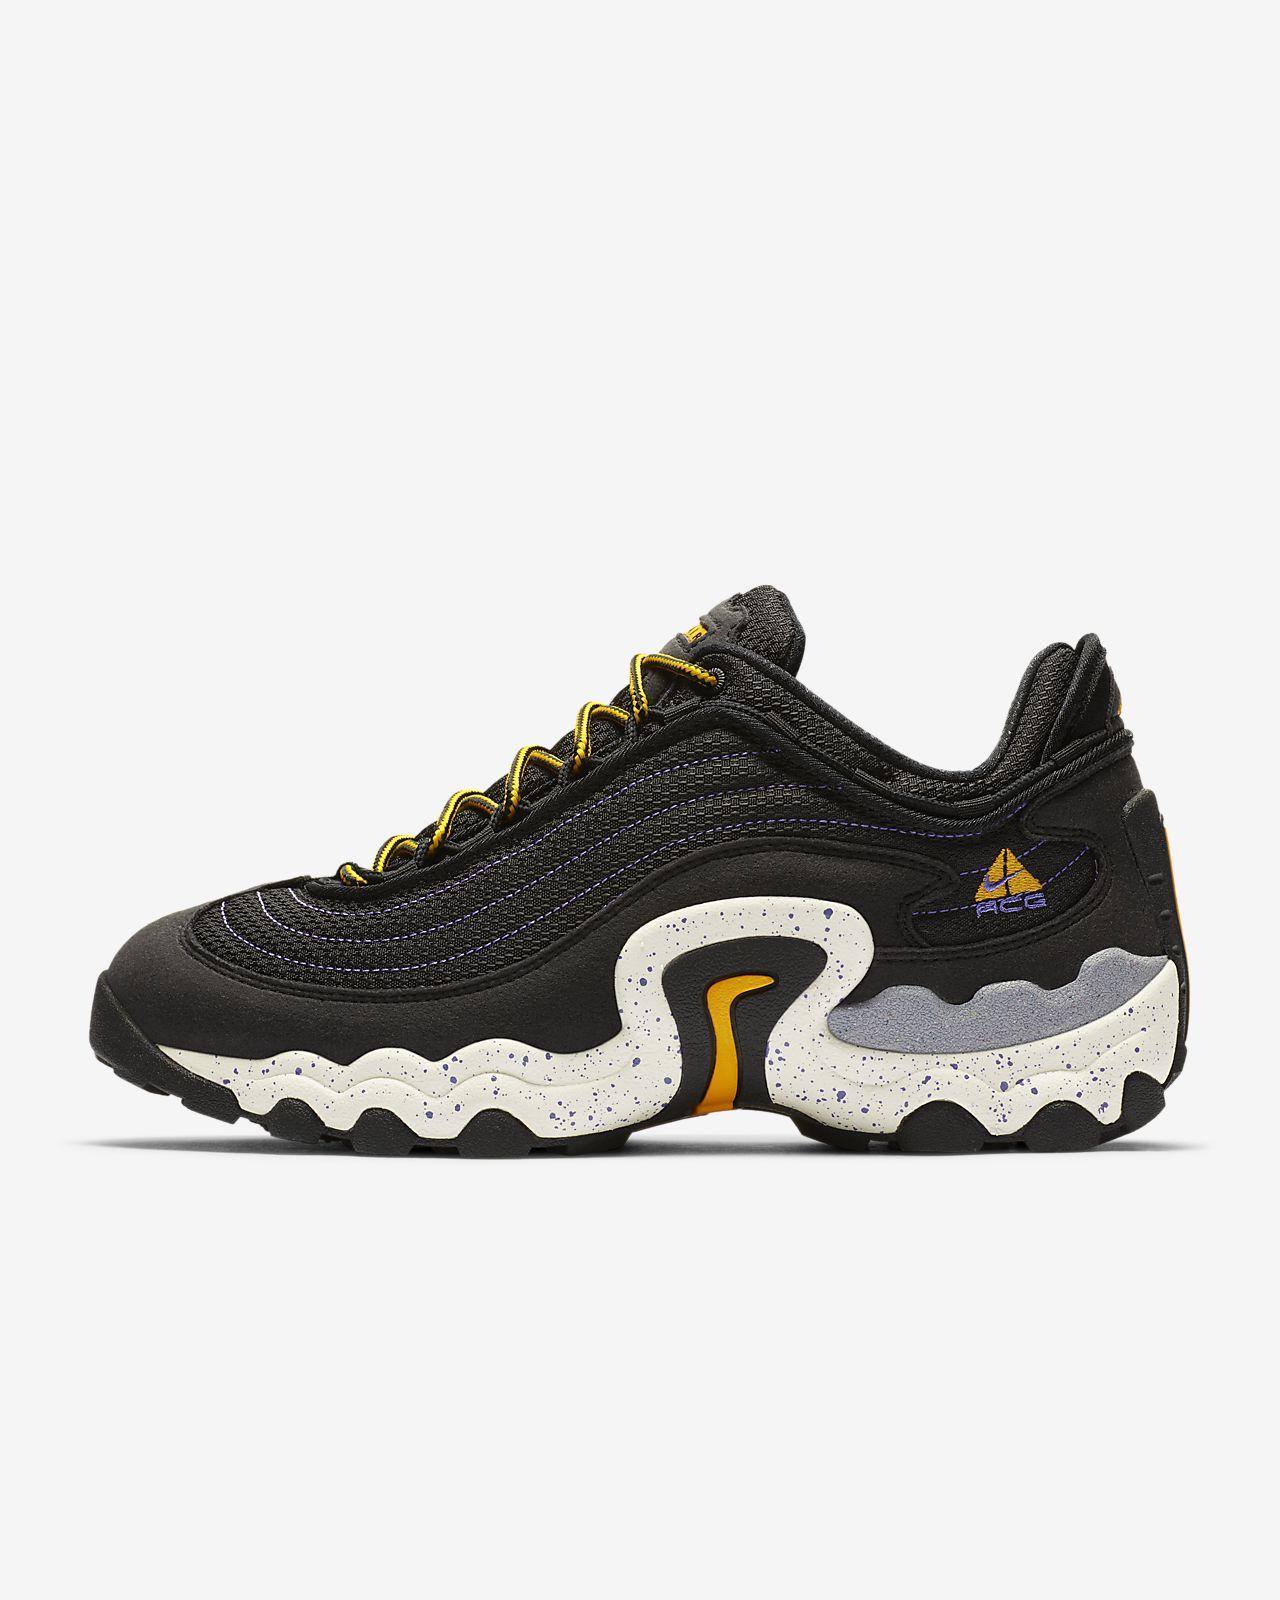 Nike Air Skarn Men's Shoe